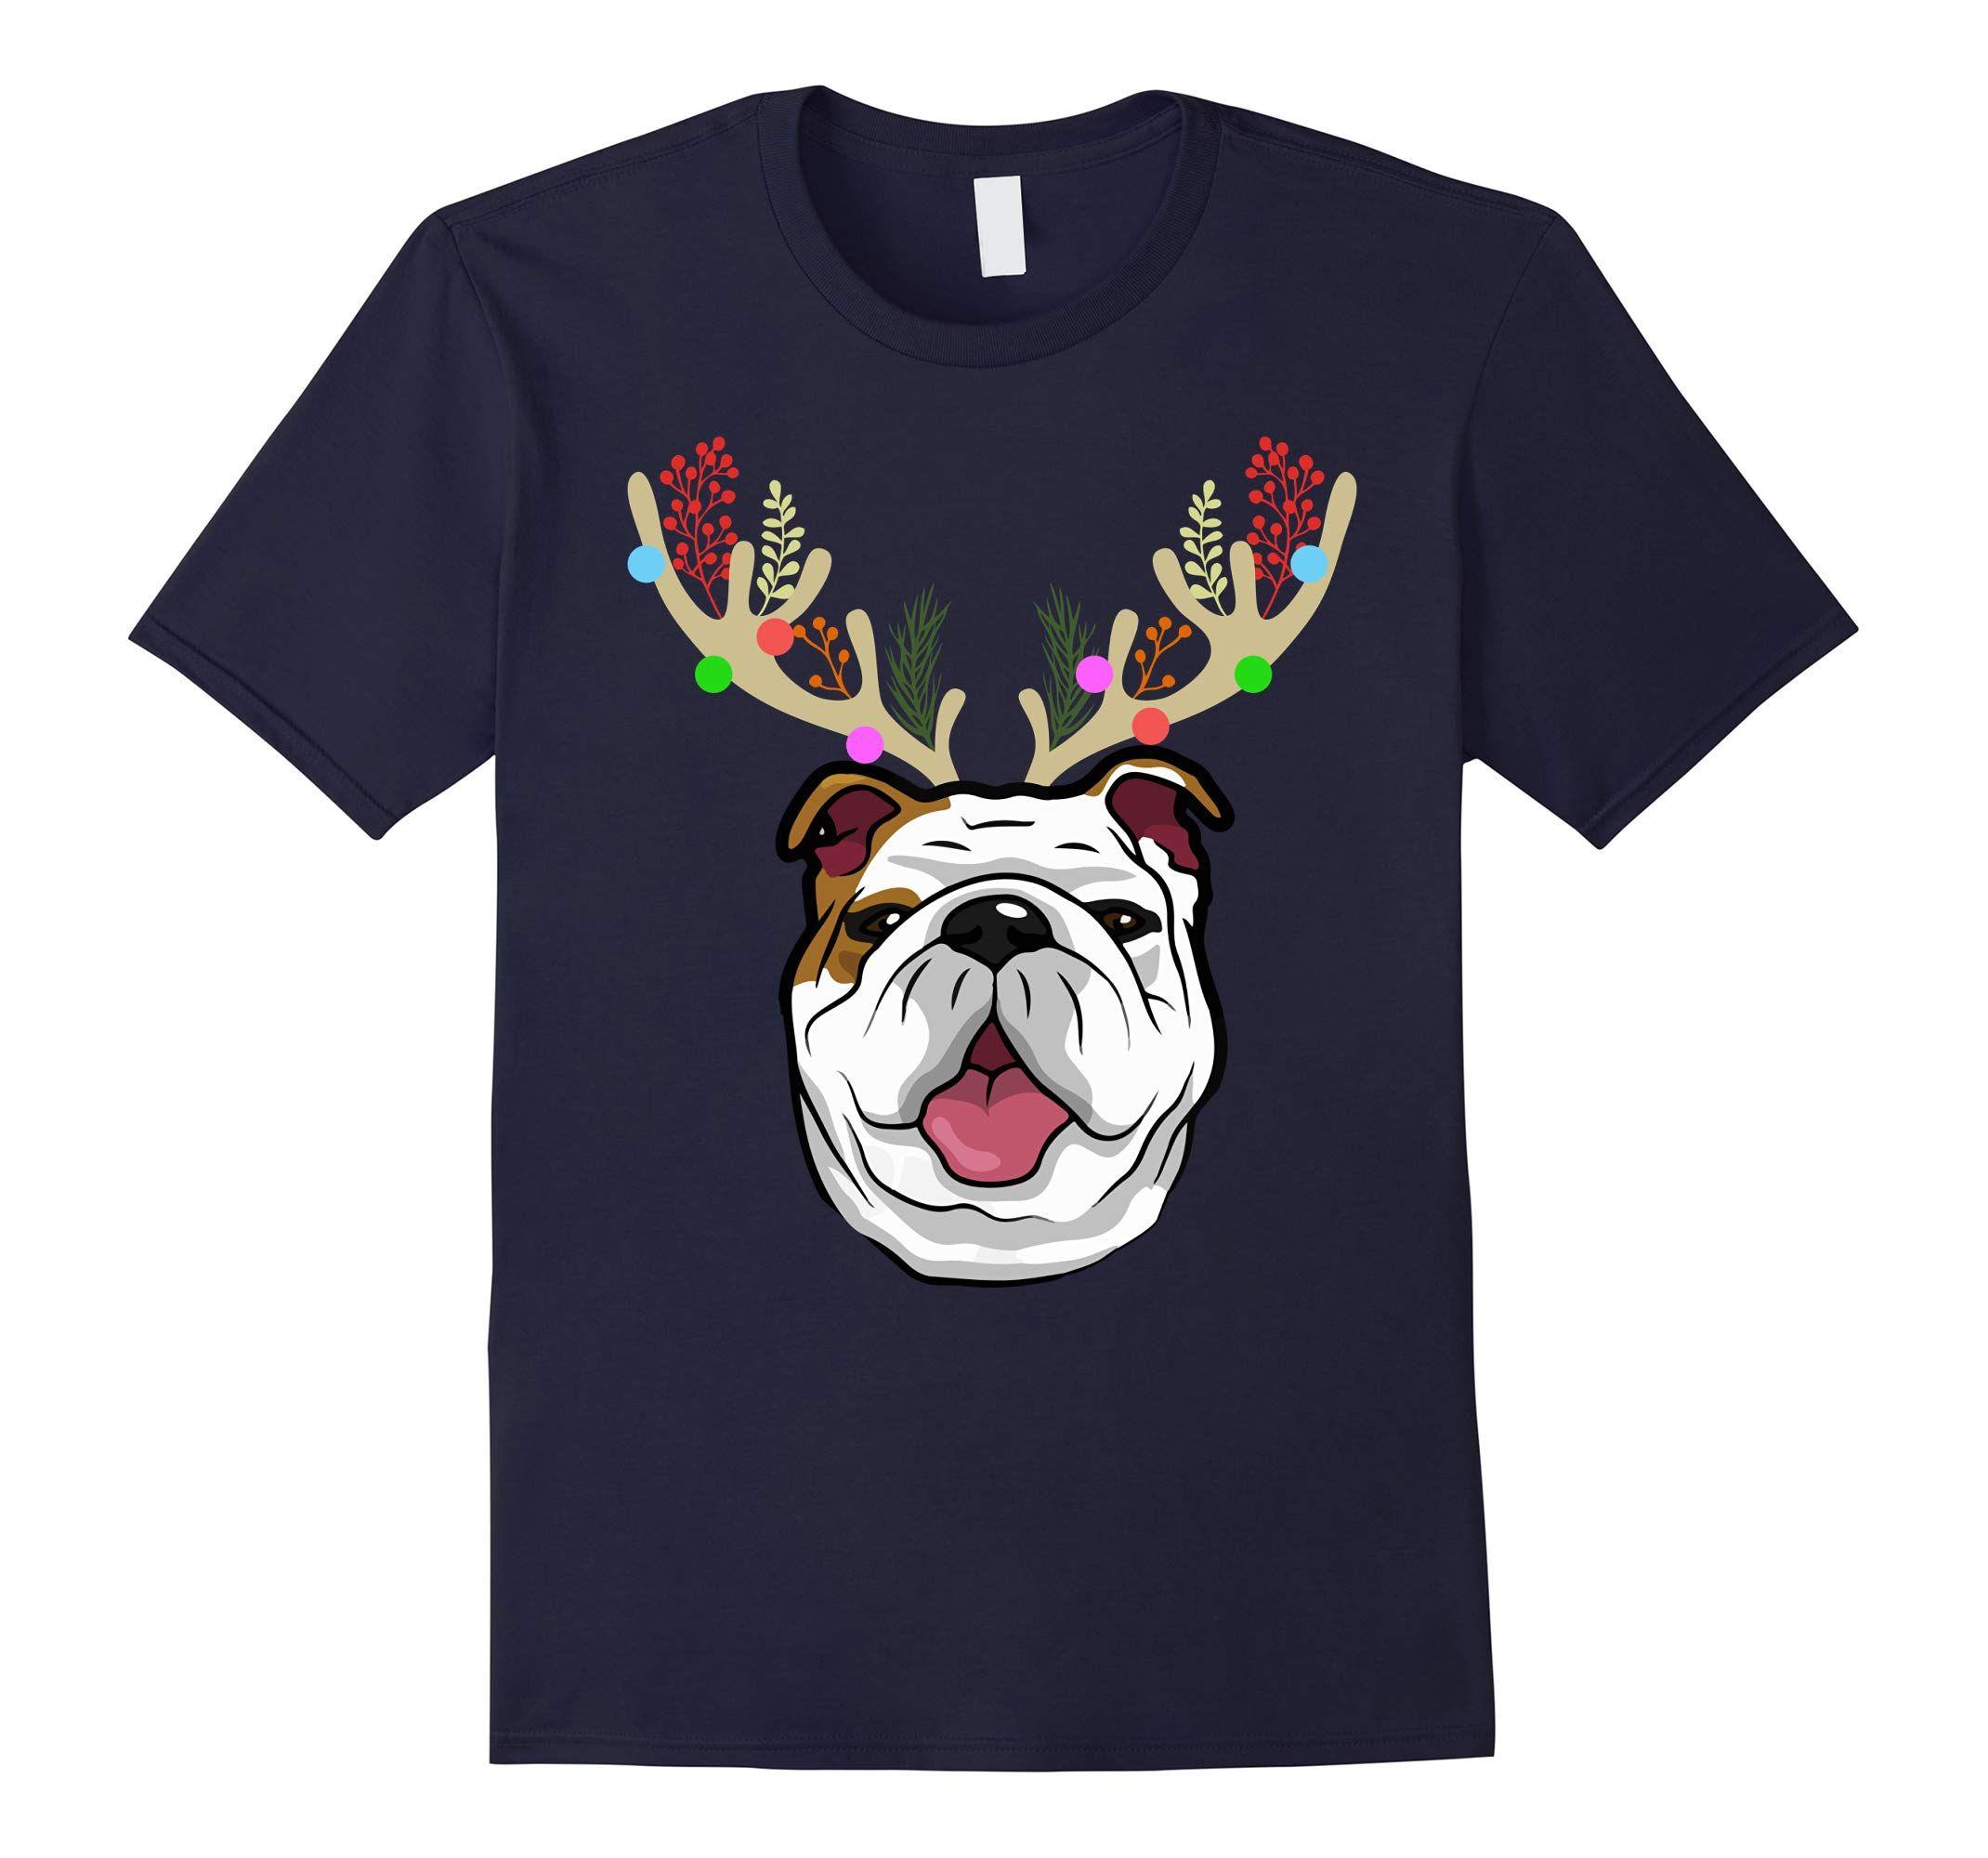 XMAS Funny Bulldogs Antlers Christmas-Veotee #funnybulldog